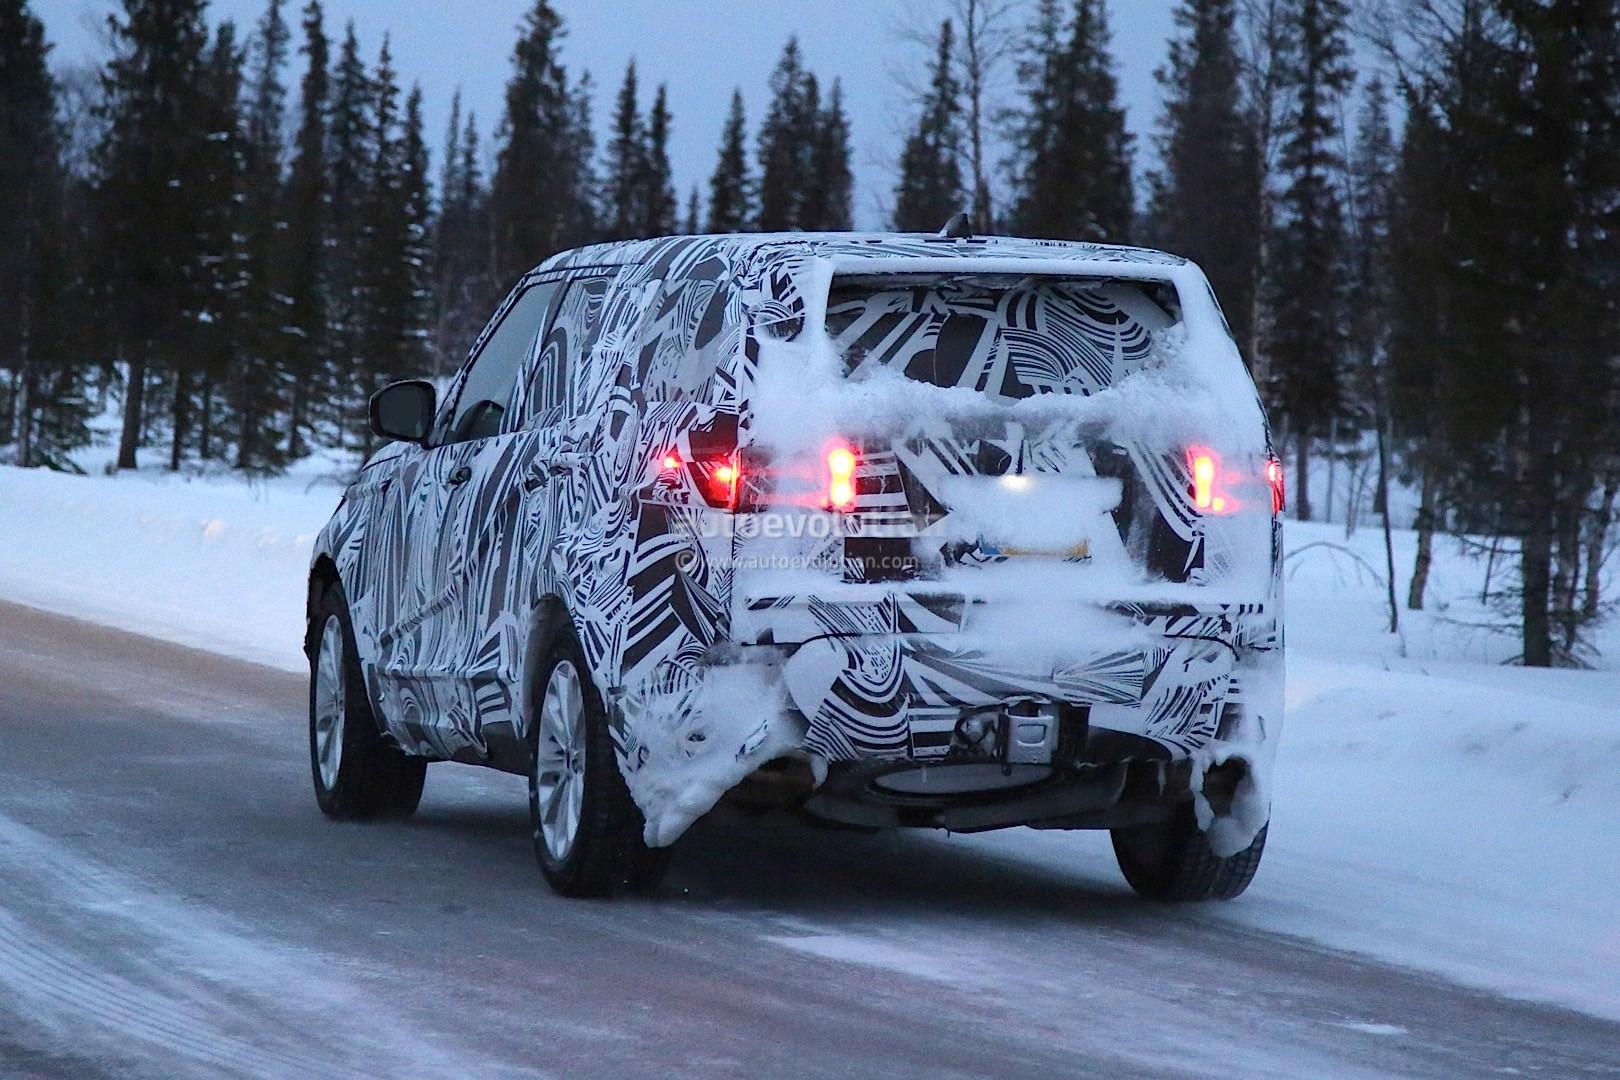 New 2017 Land Rover Discovery Spy Photo Price Rumors | 2017 - 2018